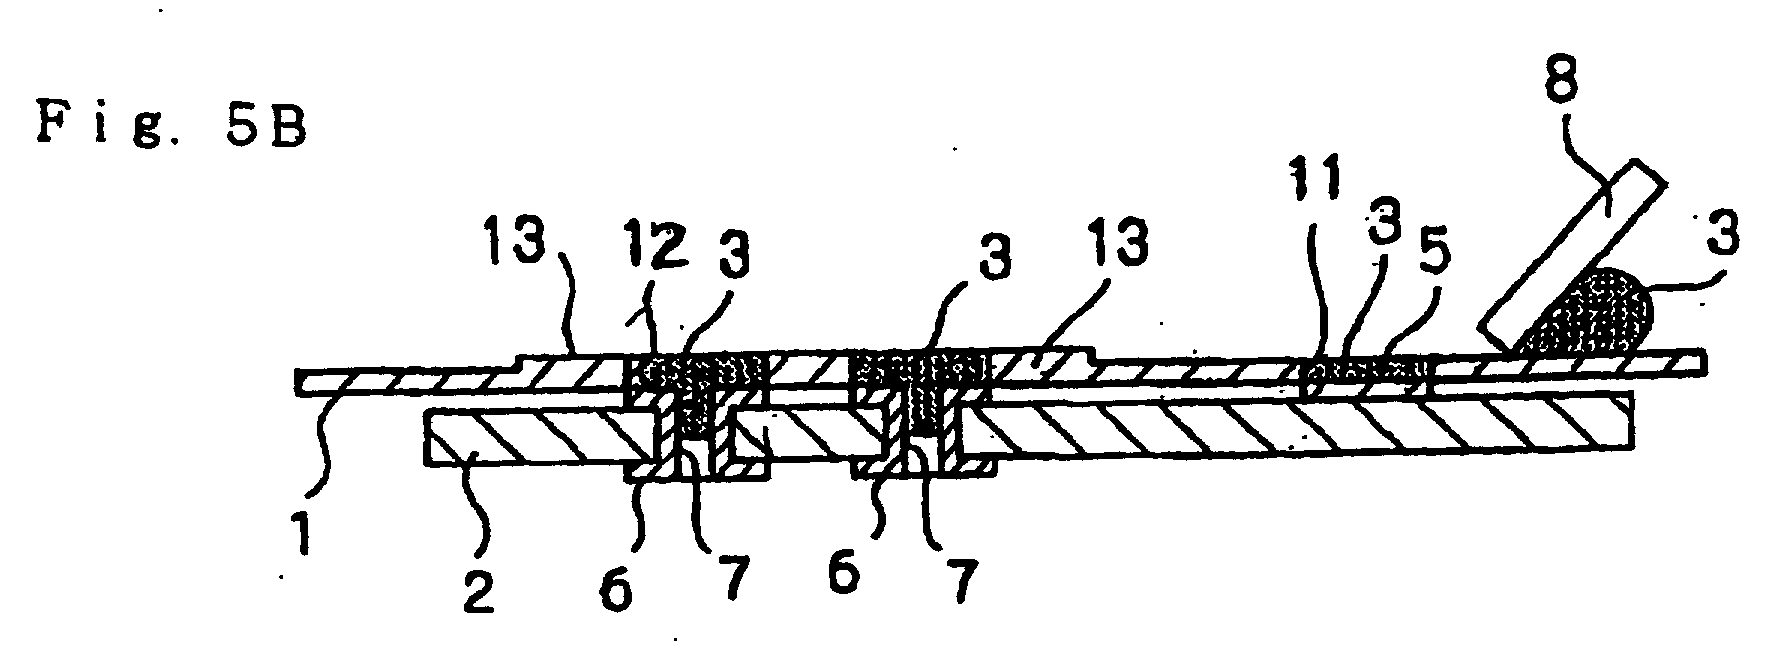 patent ep1263272a3